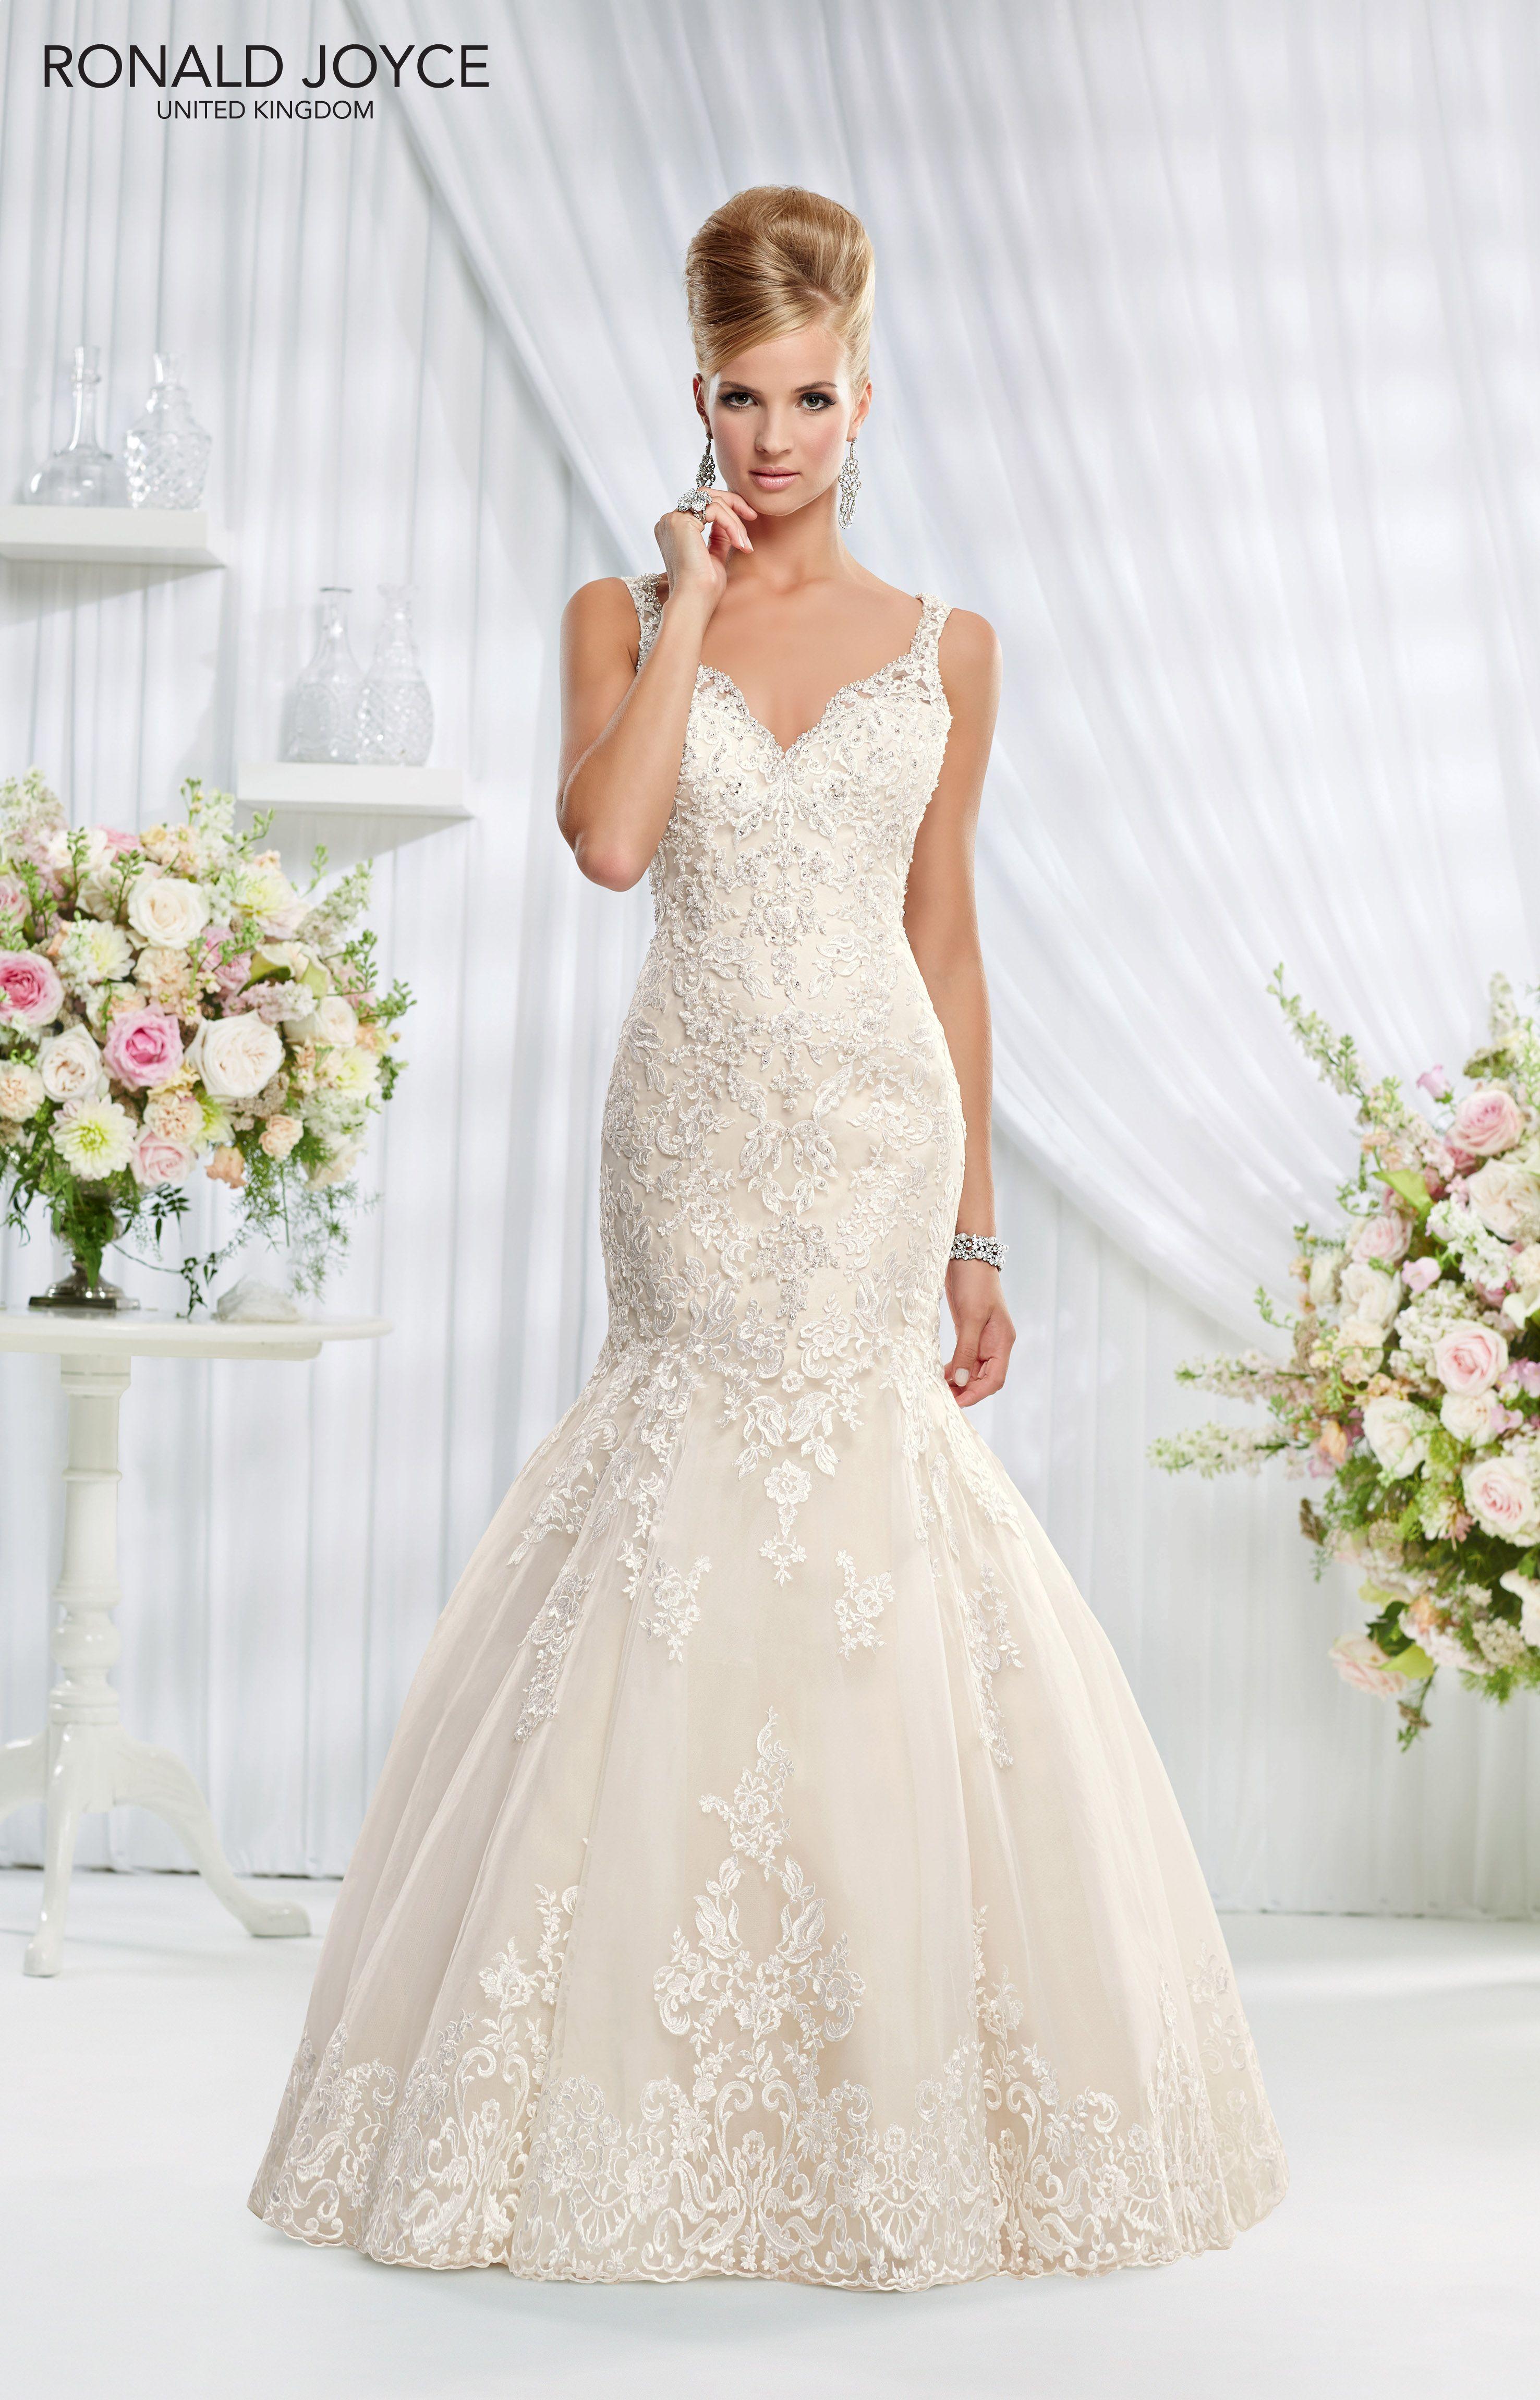 Erin by ronald joyce available at bridalwear by emma louise available at bridalwear by emma louise bolton ombrellifo Gallery